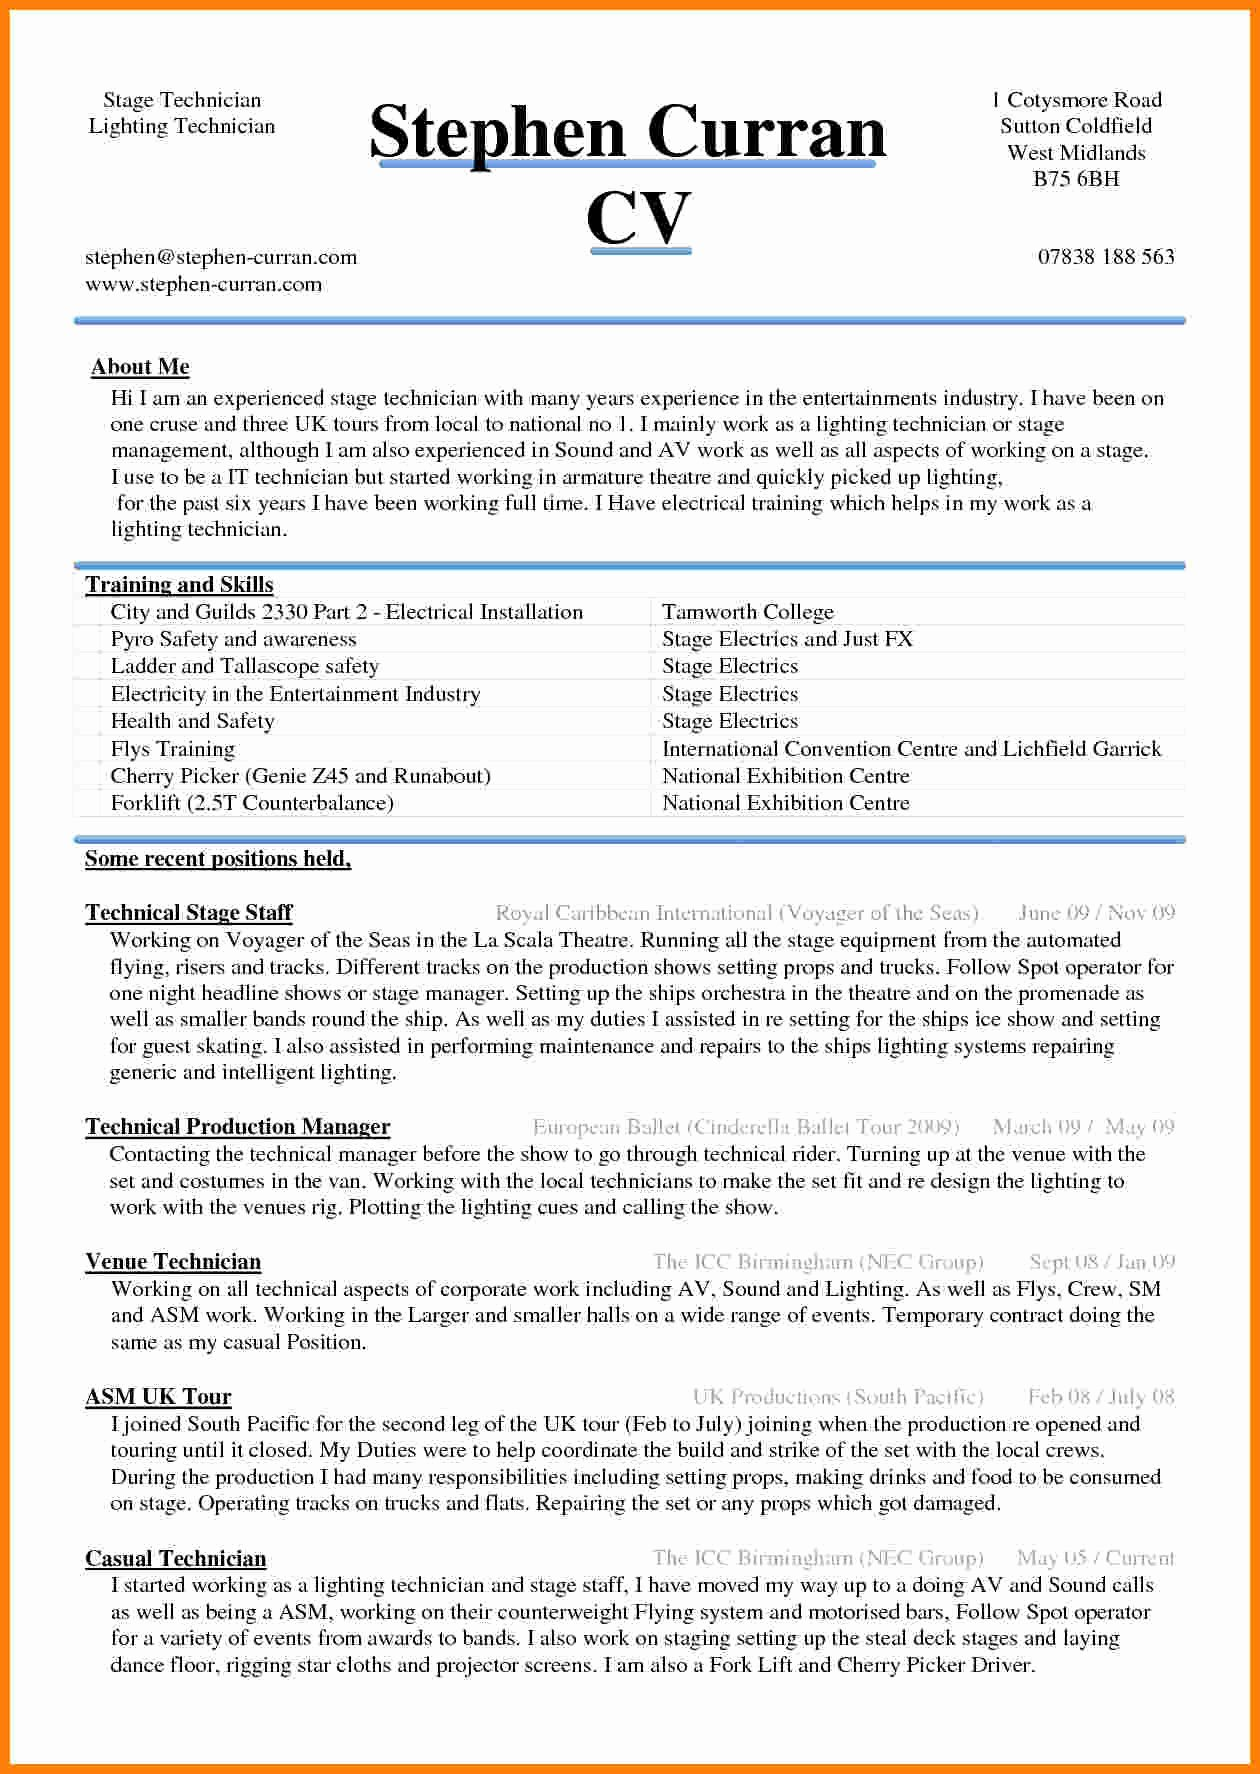 5 Cv Sample Word Document